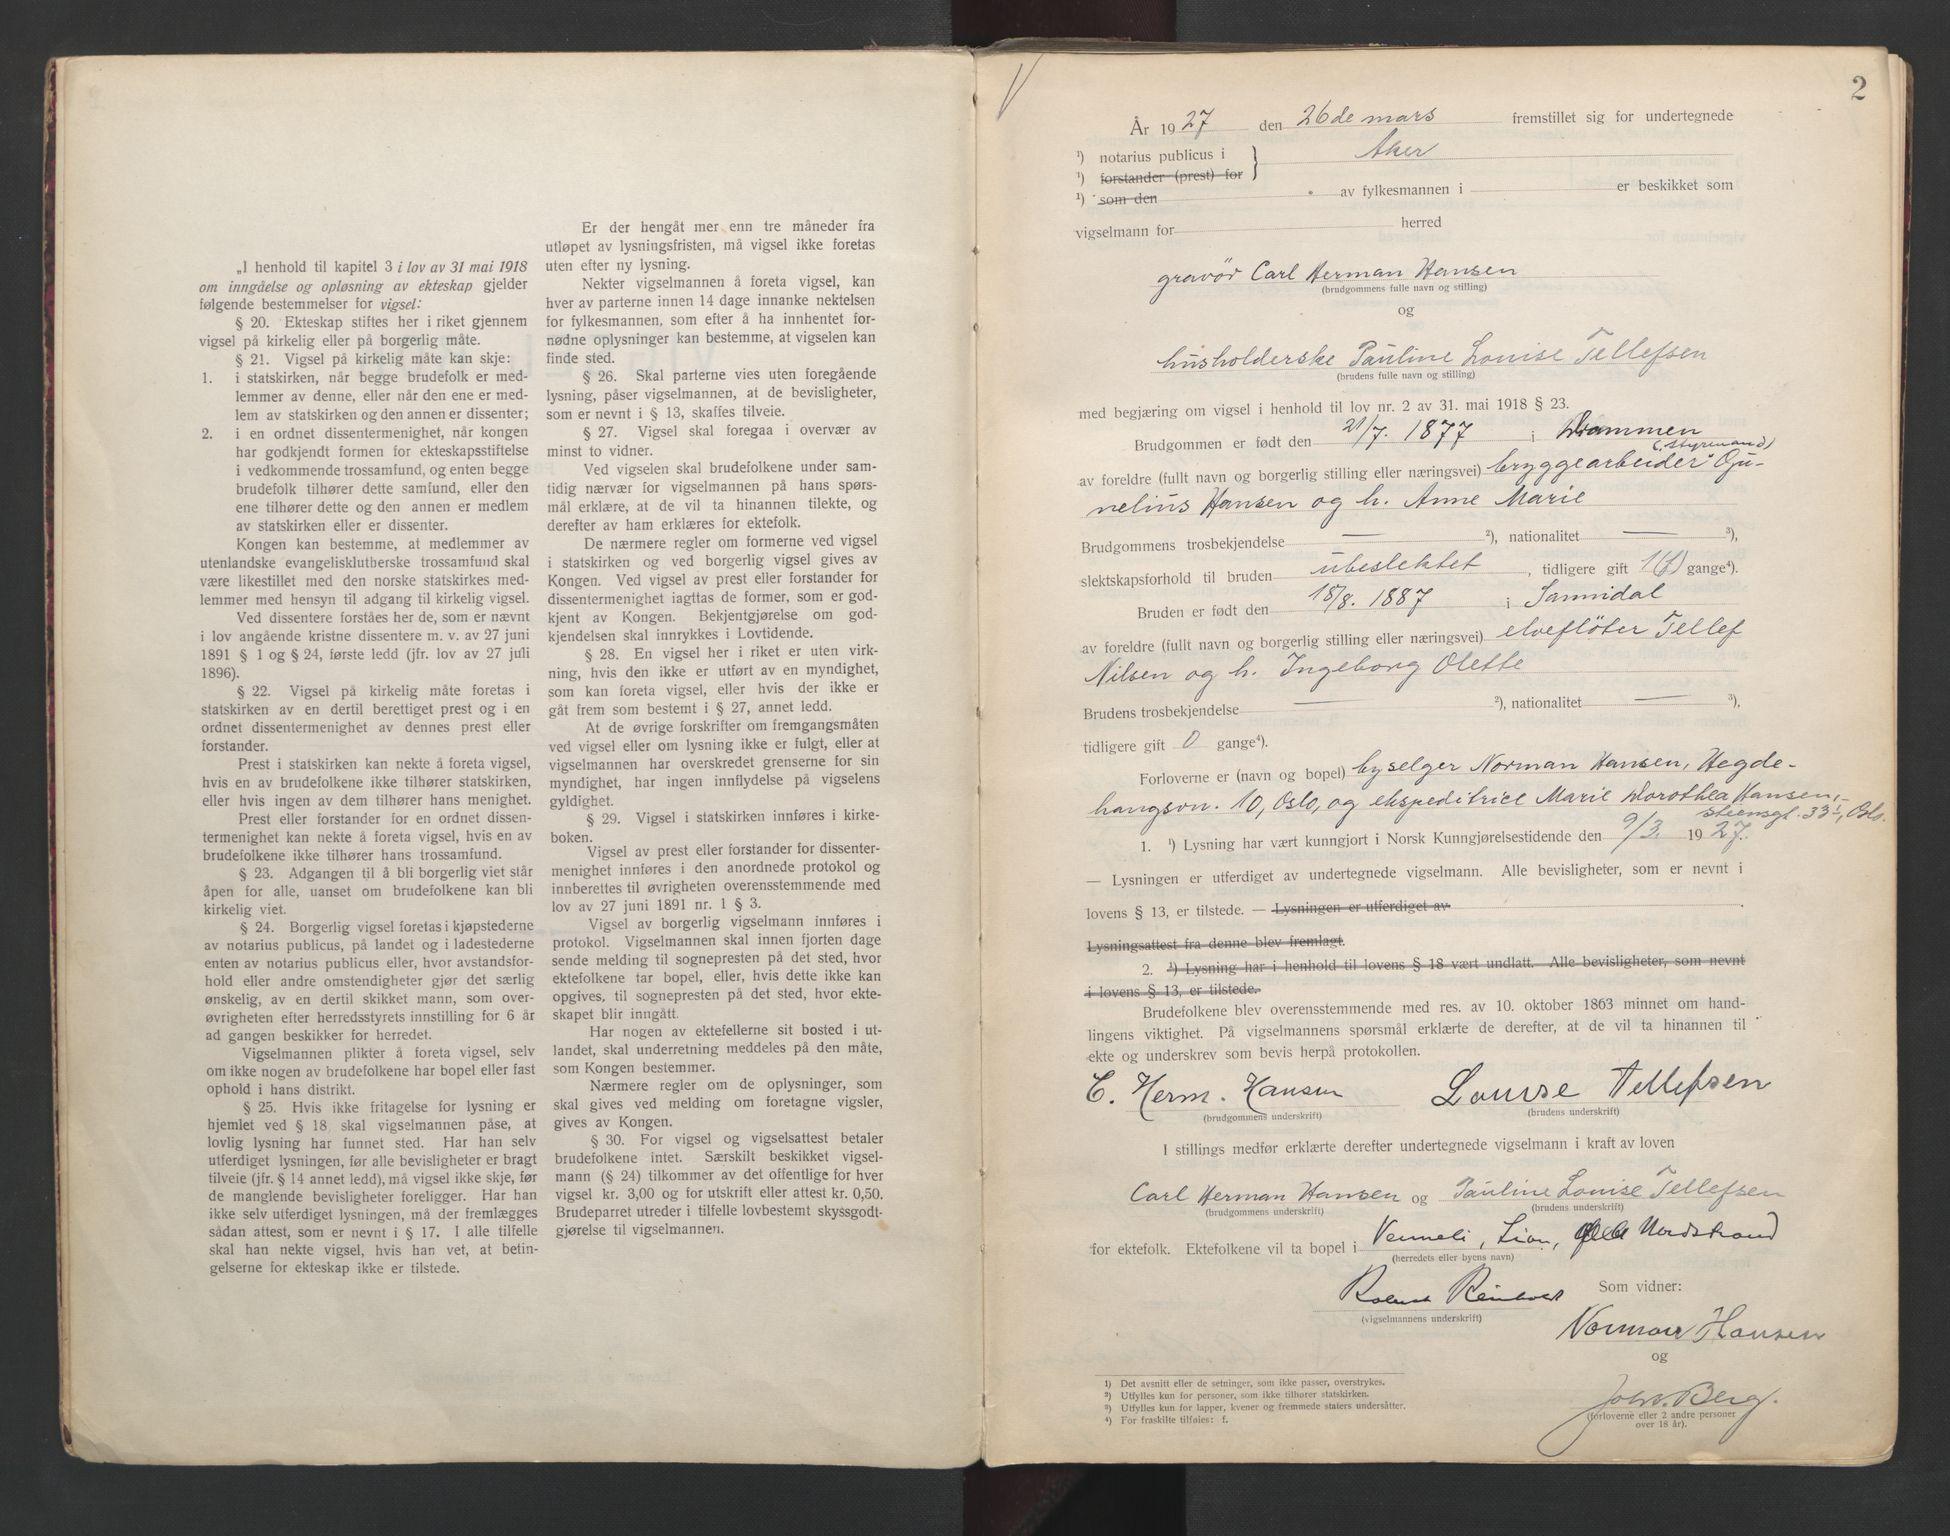 SAO, Aker sorenskriveri, L/Lc/Lcb/L0004: Vigselprotokoll, 1927-1929, s. 2